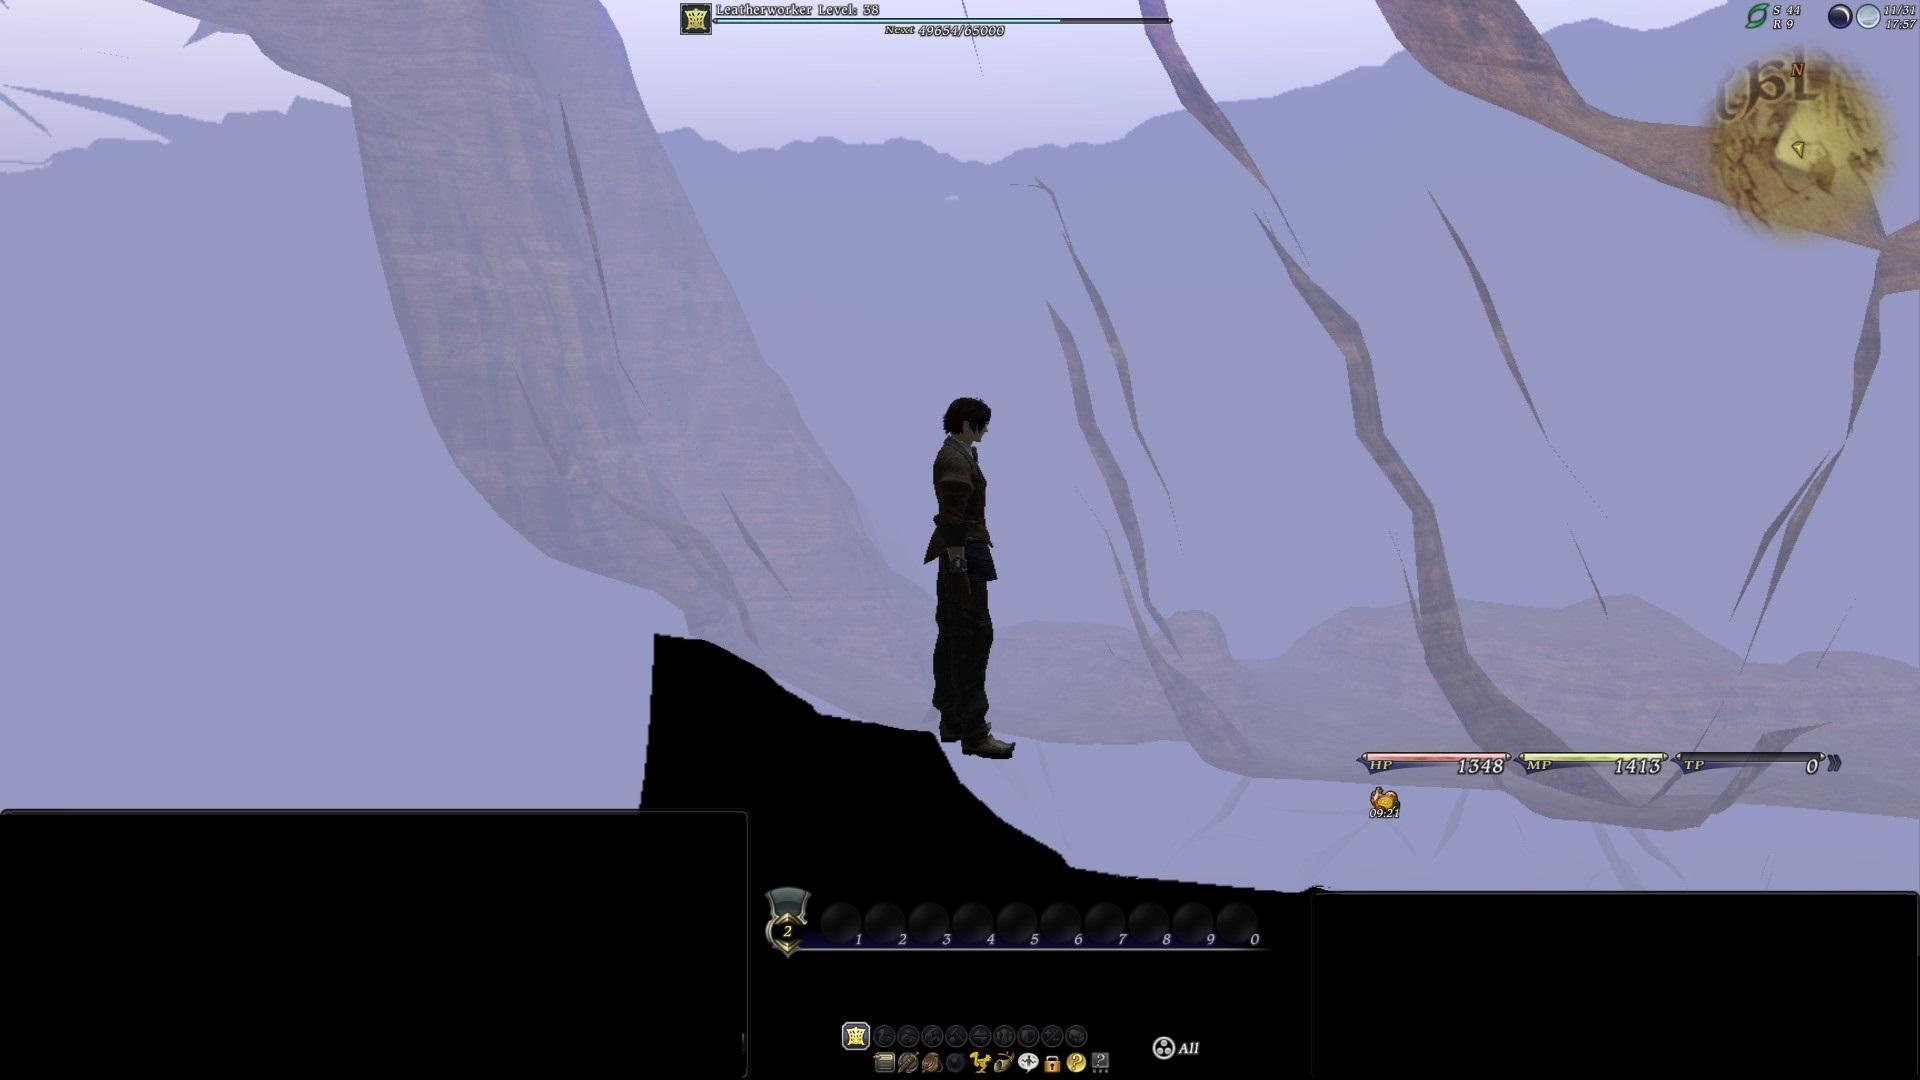 niiro ffxiv beta still edit ignore this favouritebest your screenshots wait post